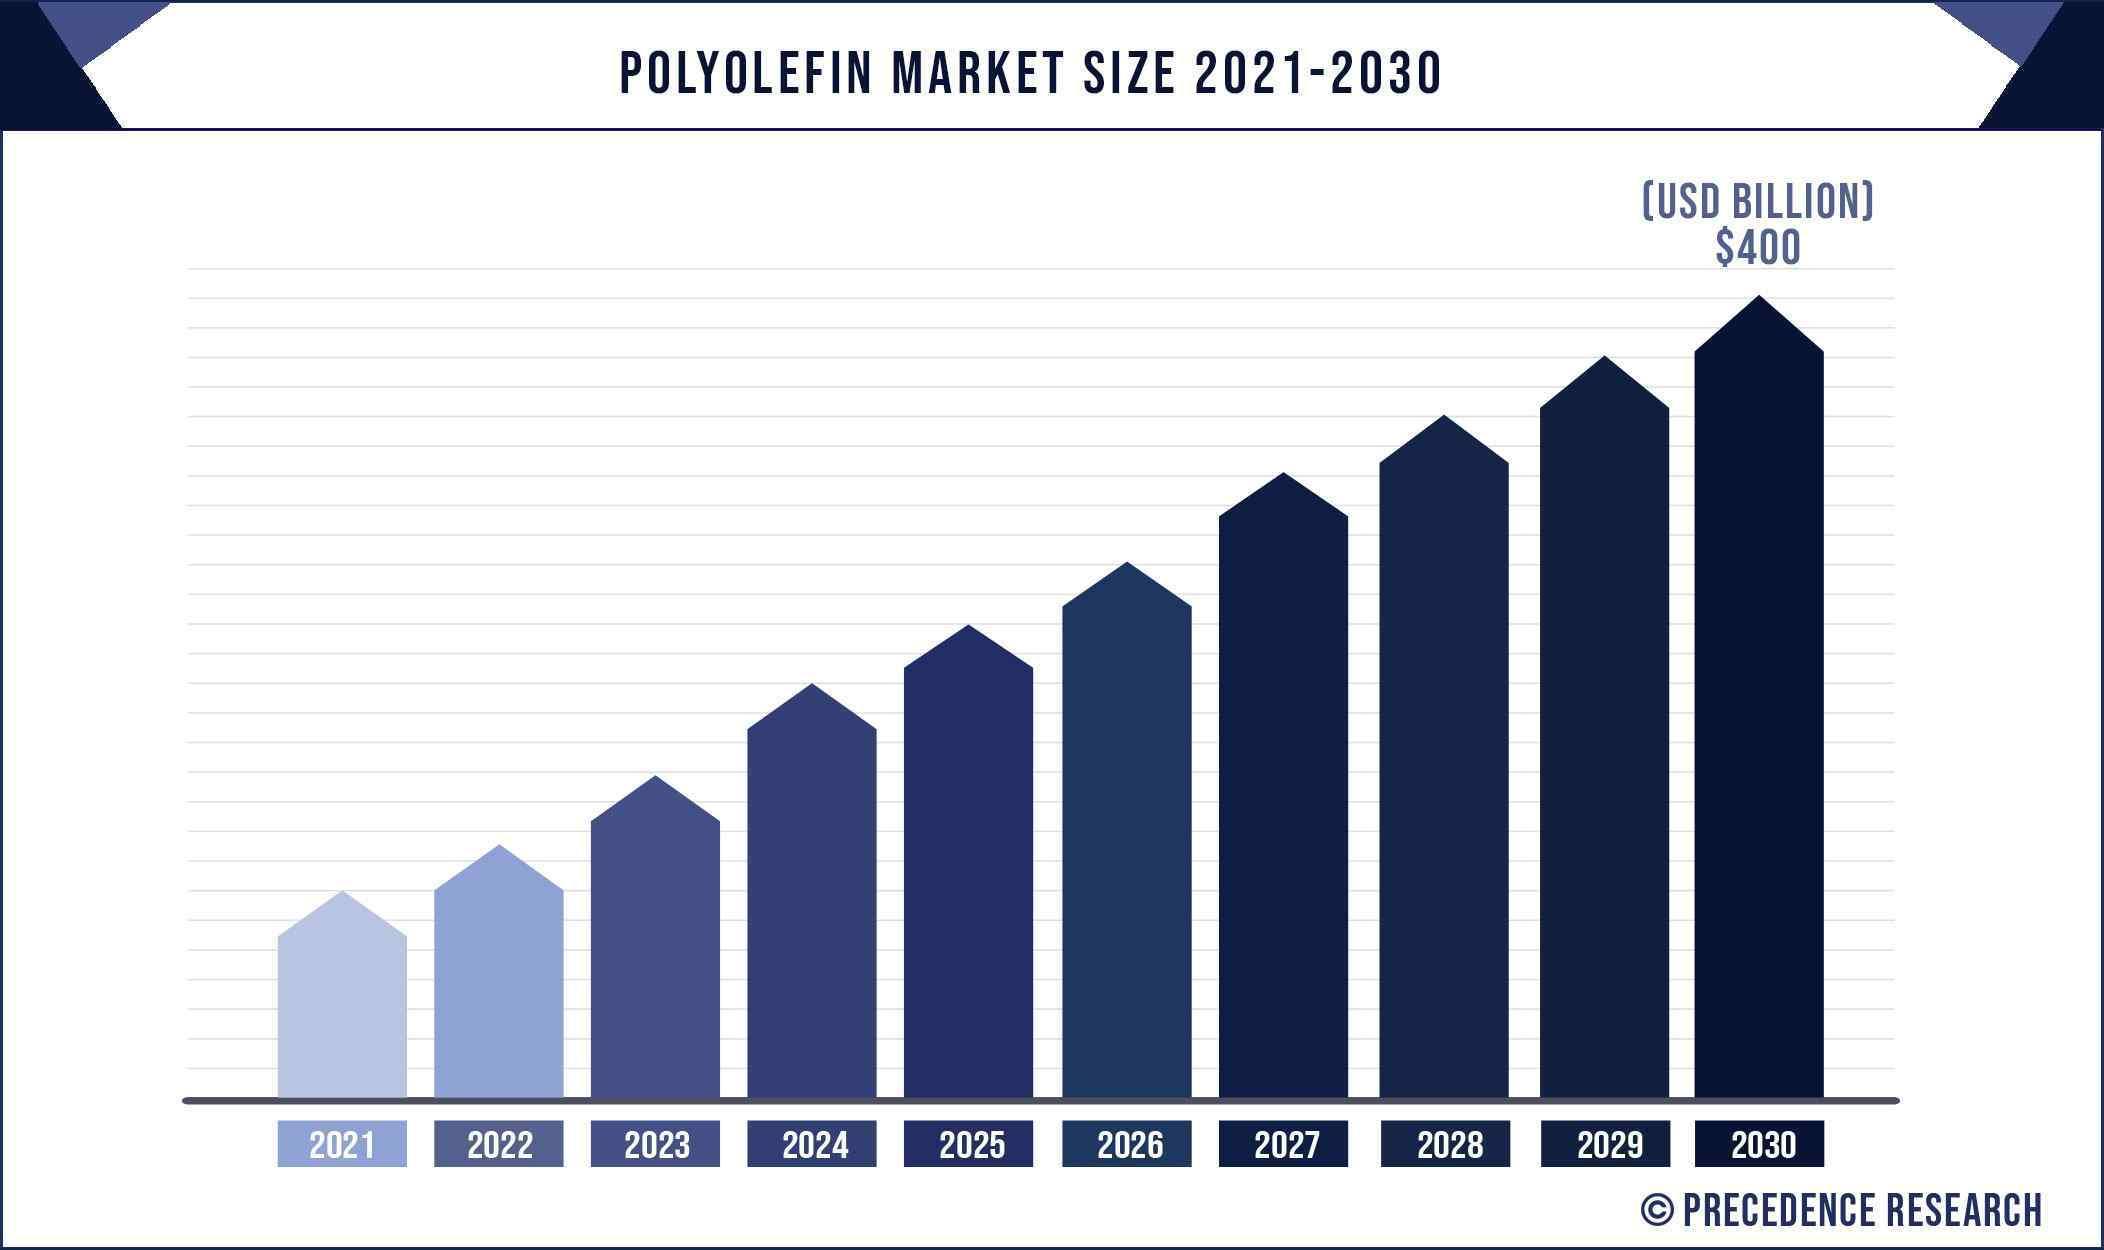 Polyolefin Market Size 2021 to 2030